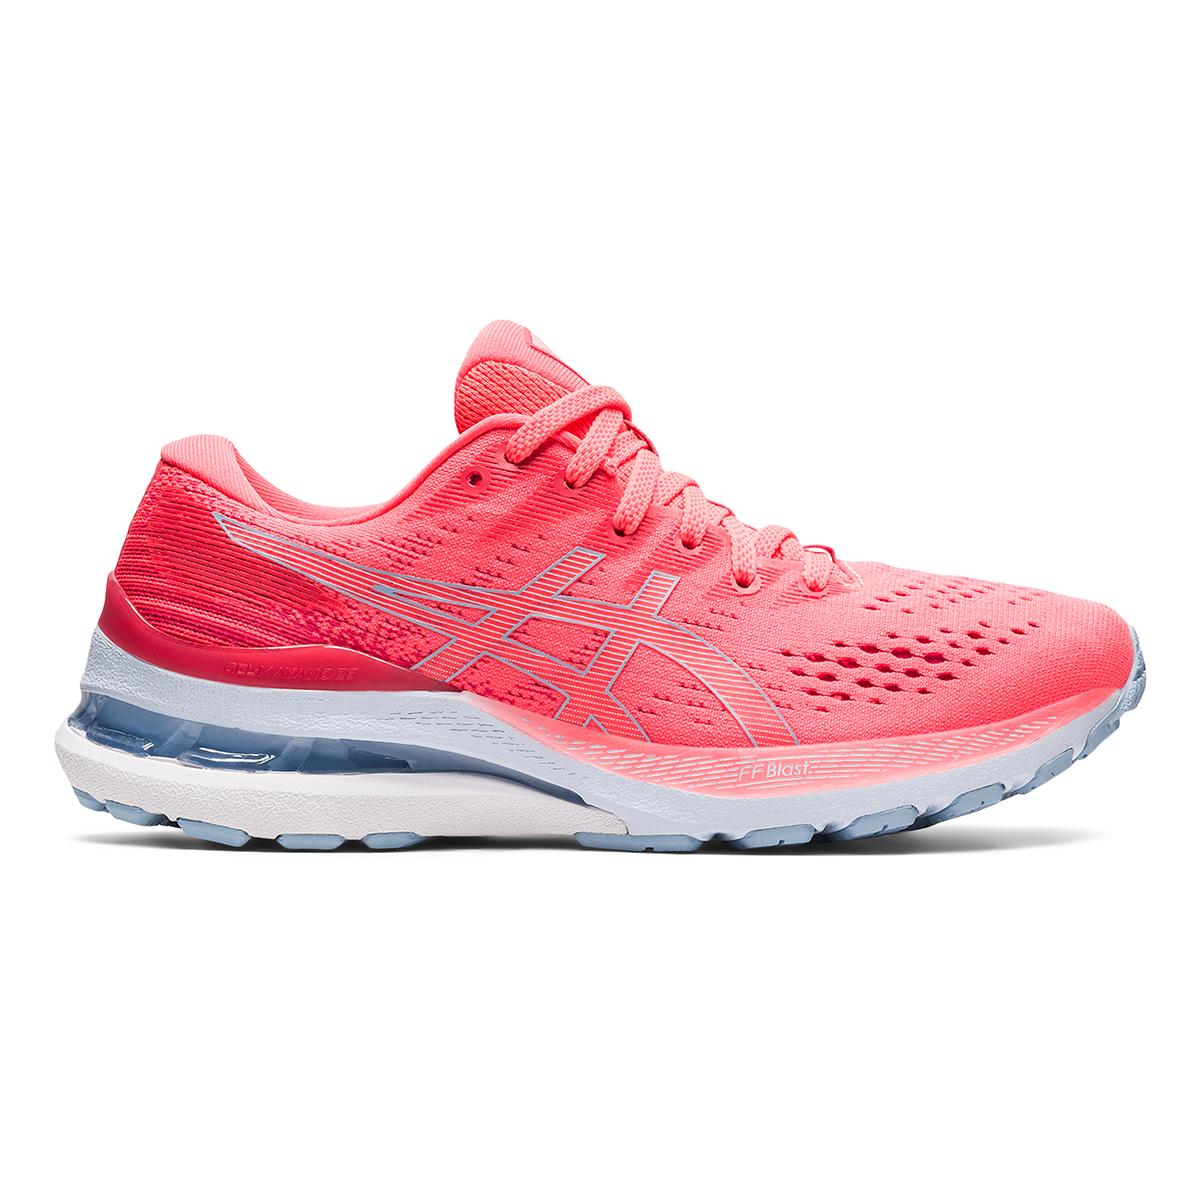 Women's Asics Gel-Kayano 28 Running Shoe - Color: Blazing Coral - Size: 5 - Width: Regular, Blazing Coral, large, image 1